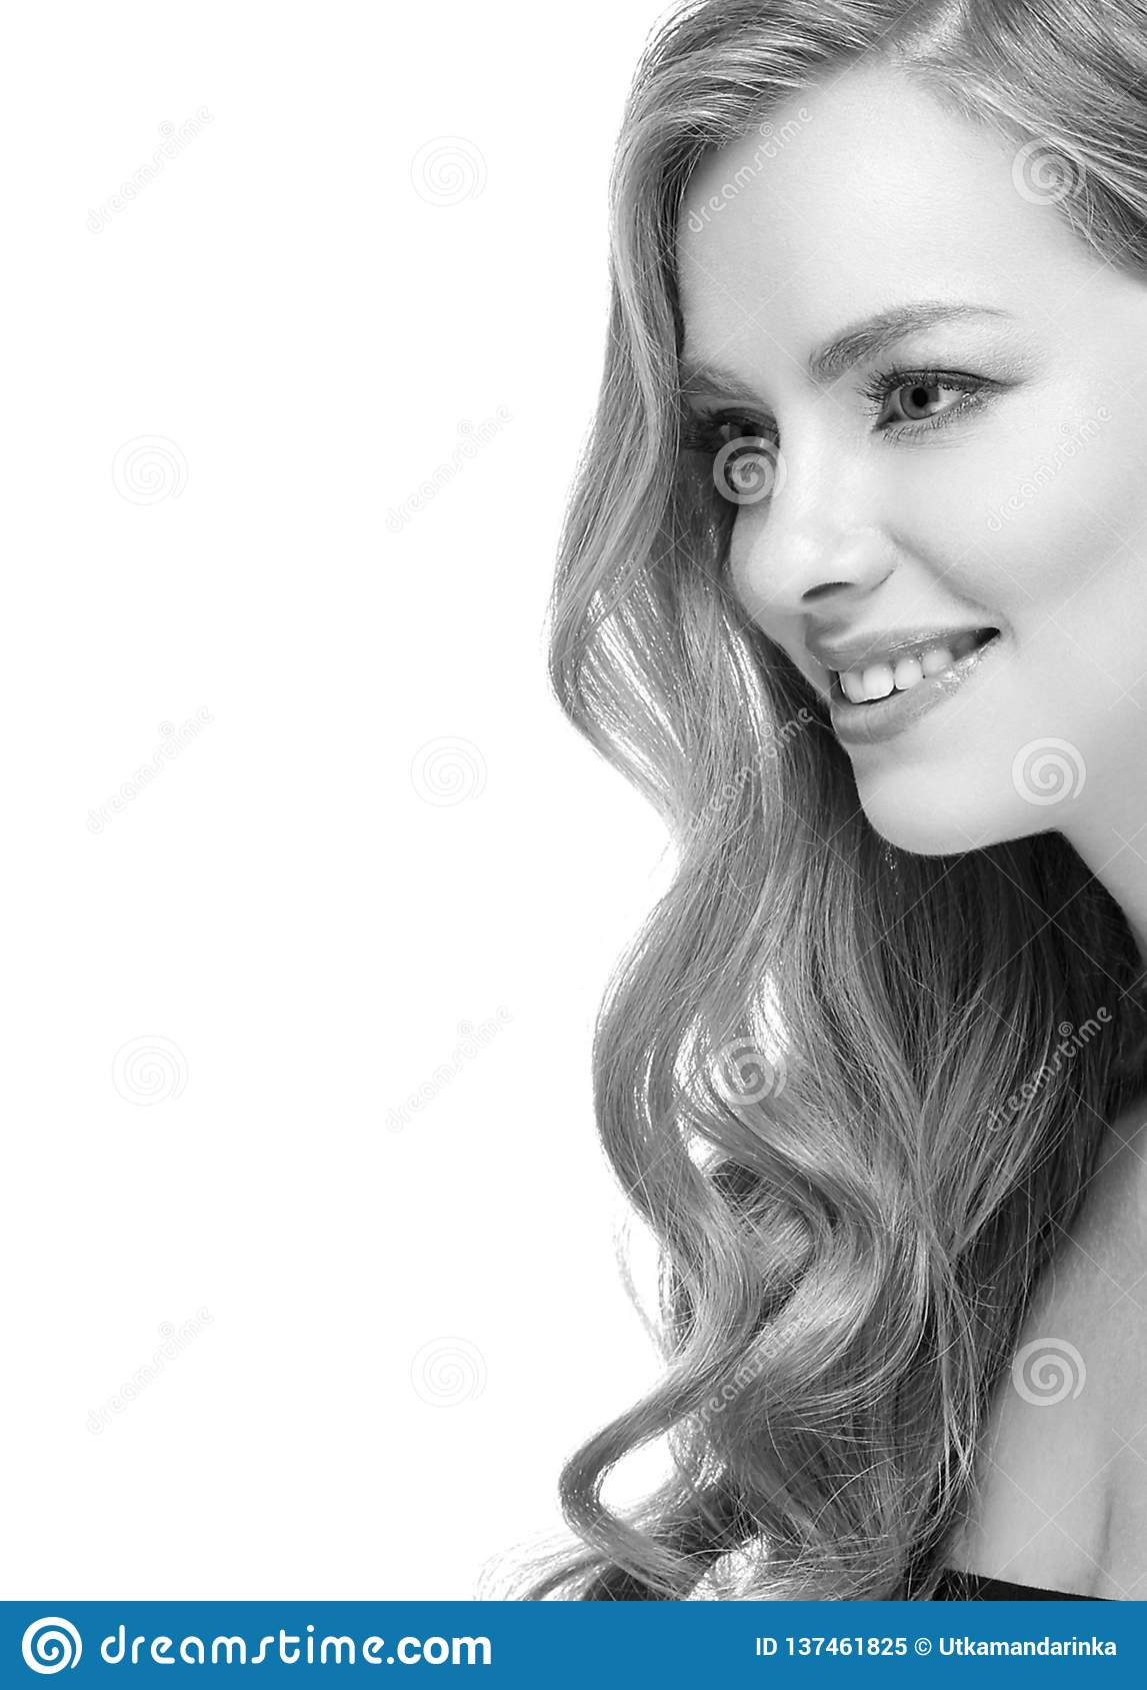 ebe0b0be4a81 Woman Headshot Face Blonde Portrait Closeup Black And White Stock ...